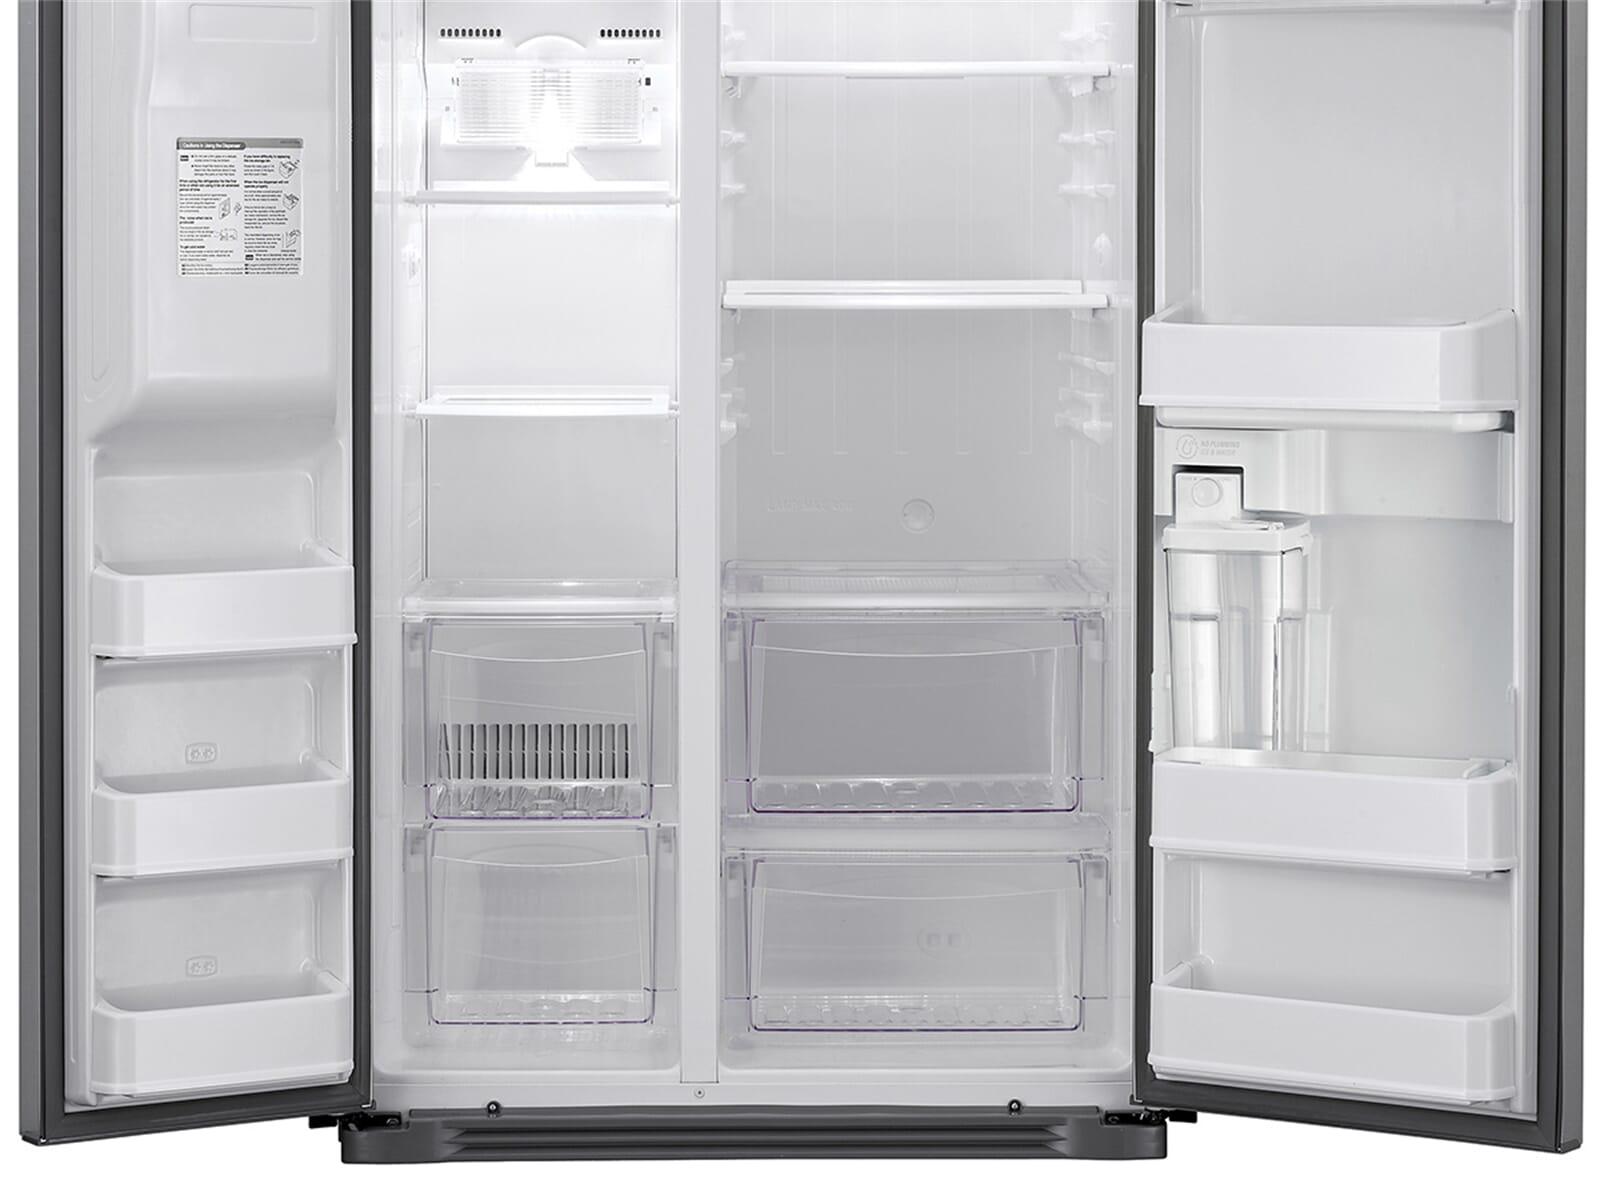 Side By Side Kühlschrank Black Friday : Wasserspender im k hlschrank smeg kühlschrank black friday